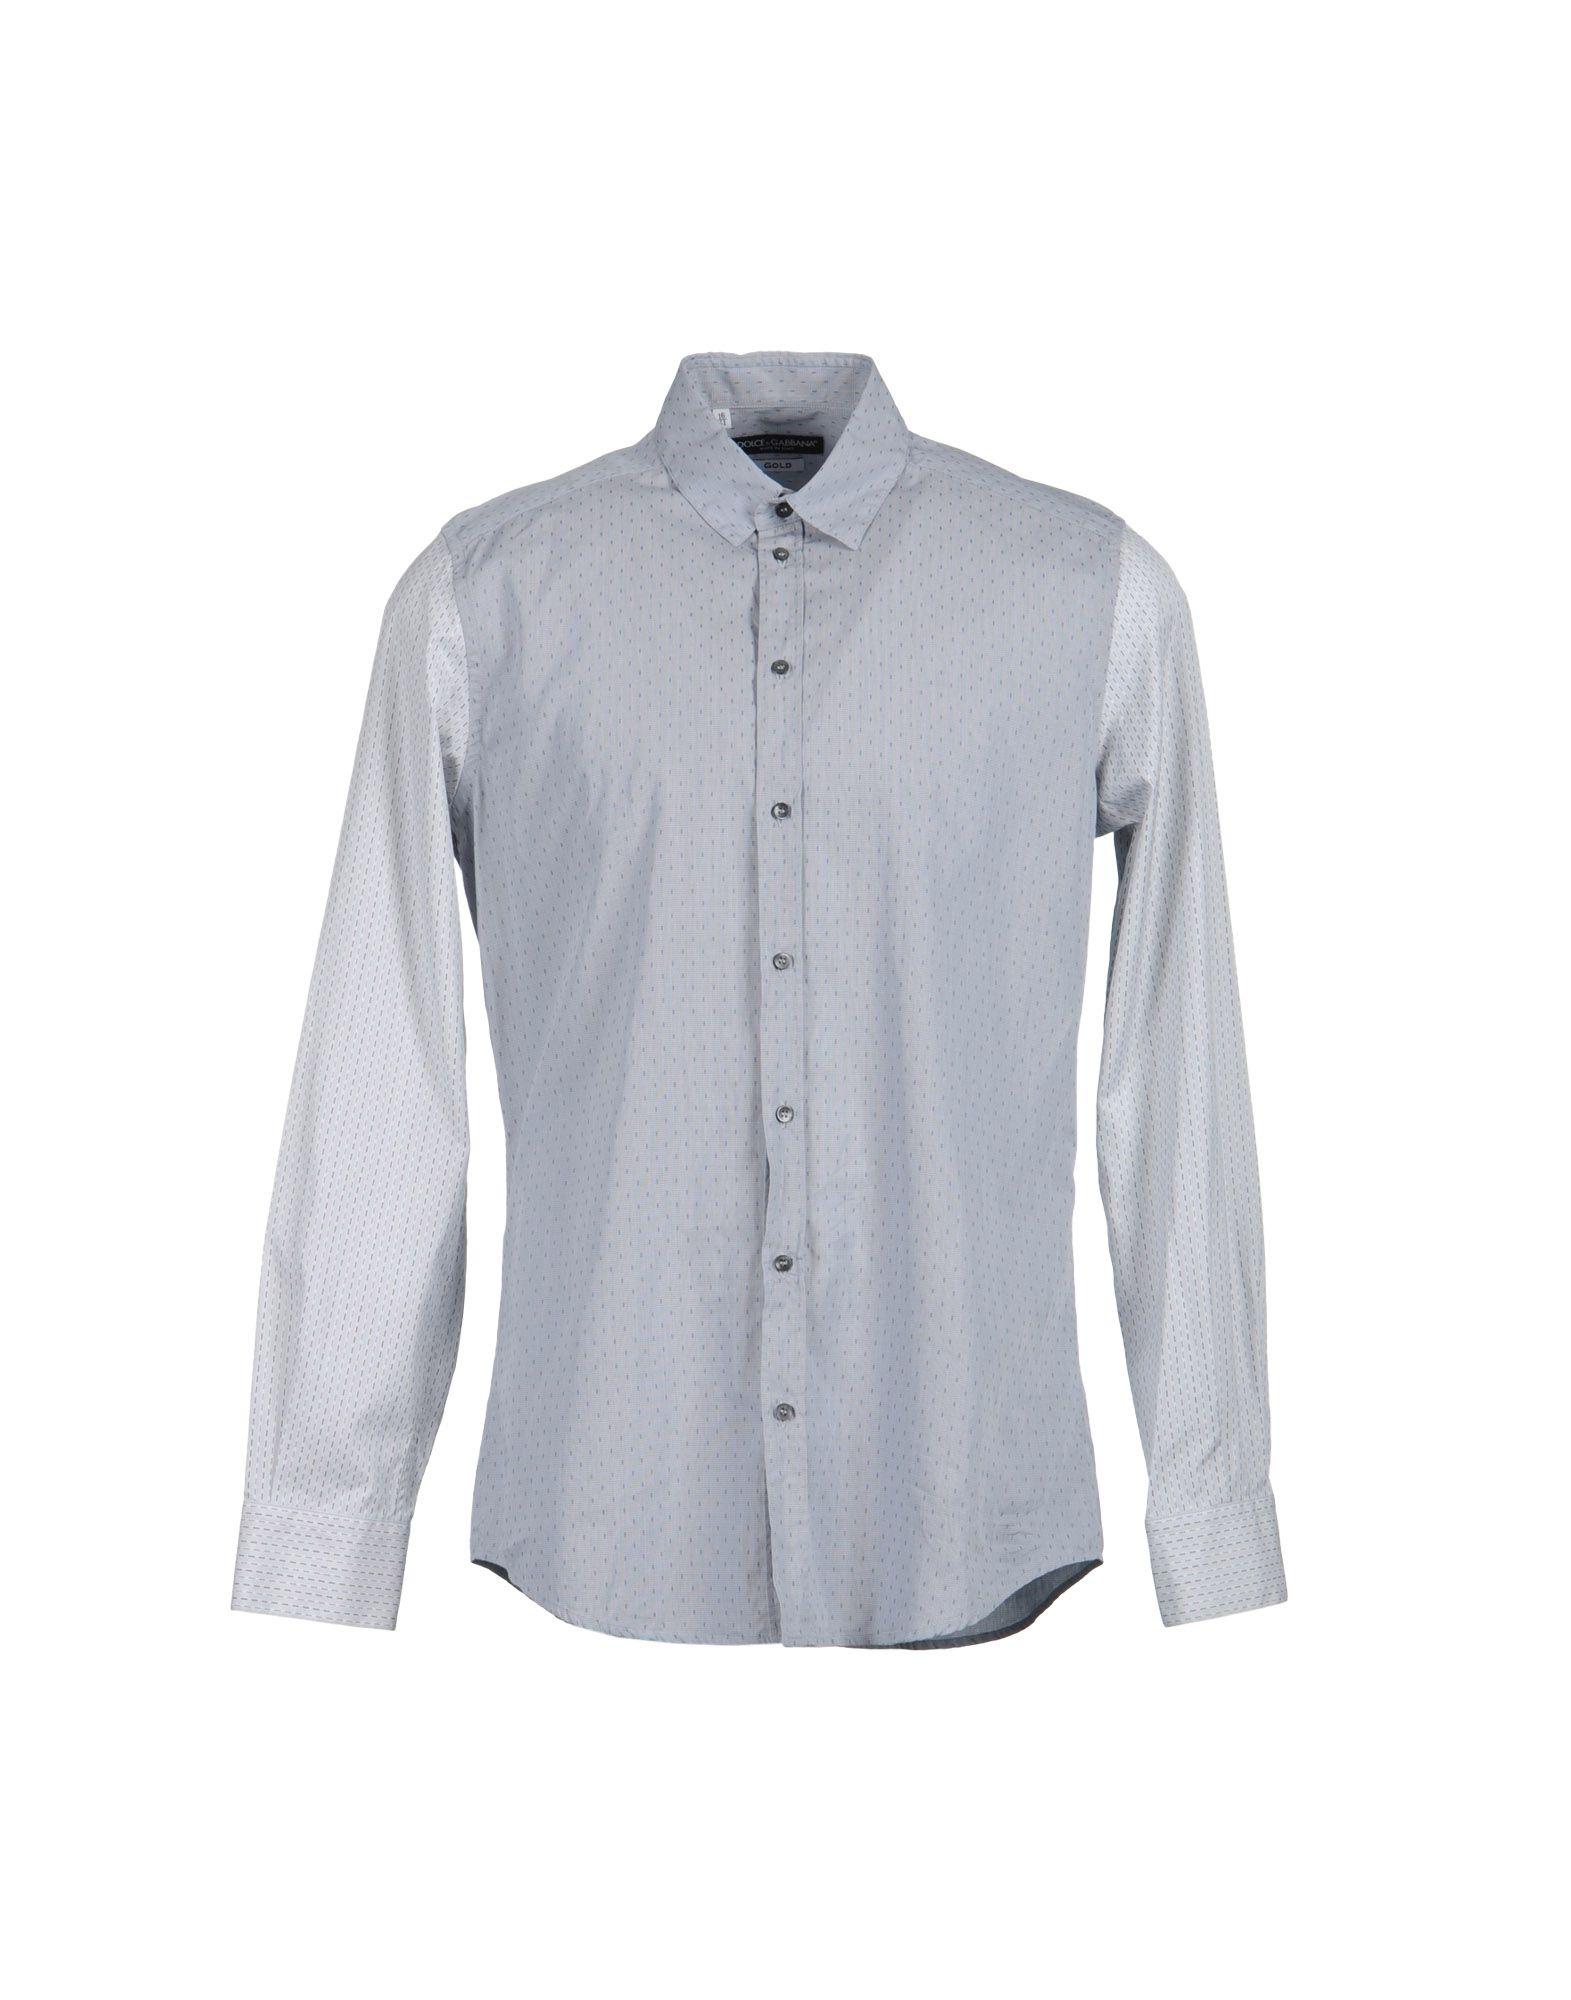 Рубашка мужская D&g 38397004lw